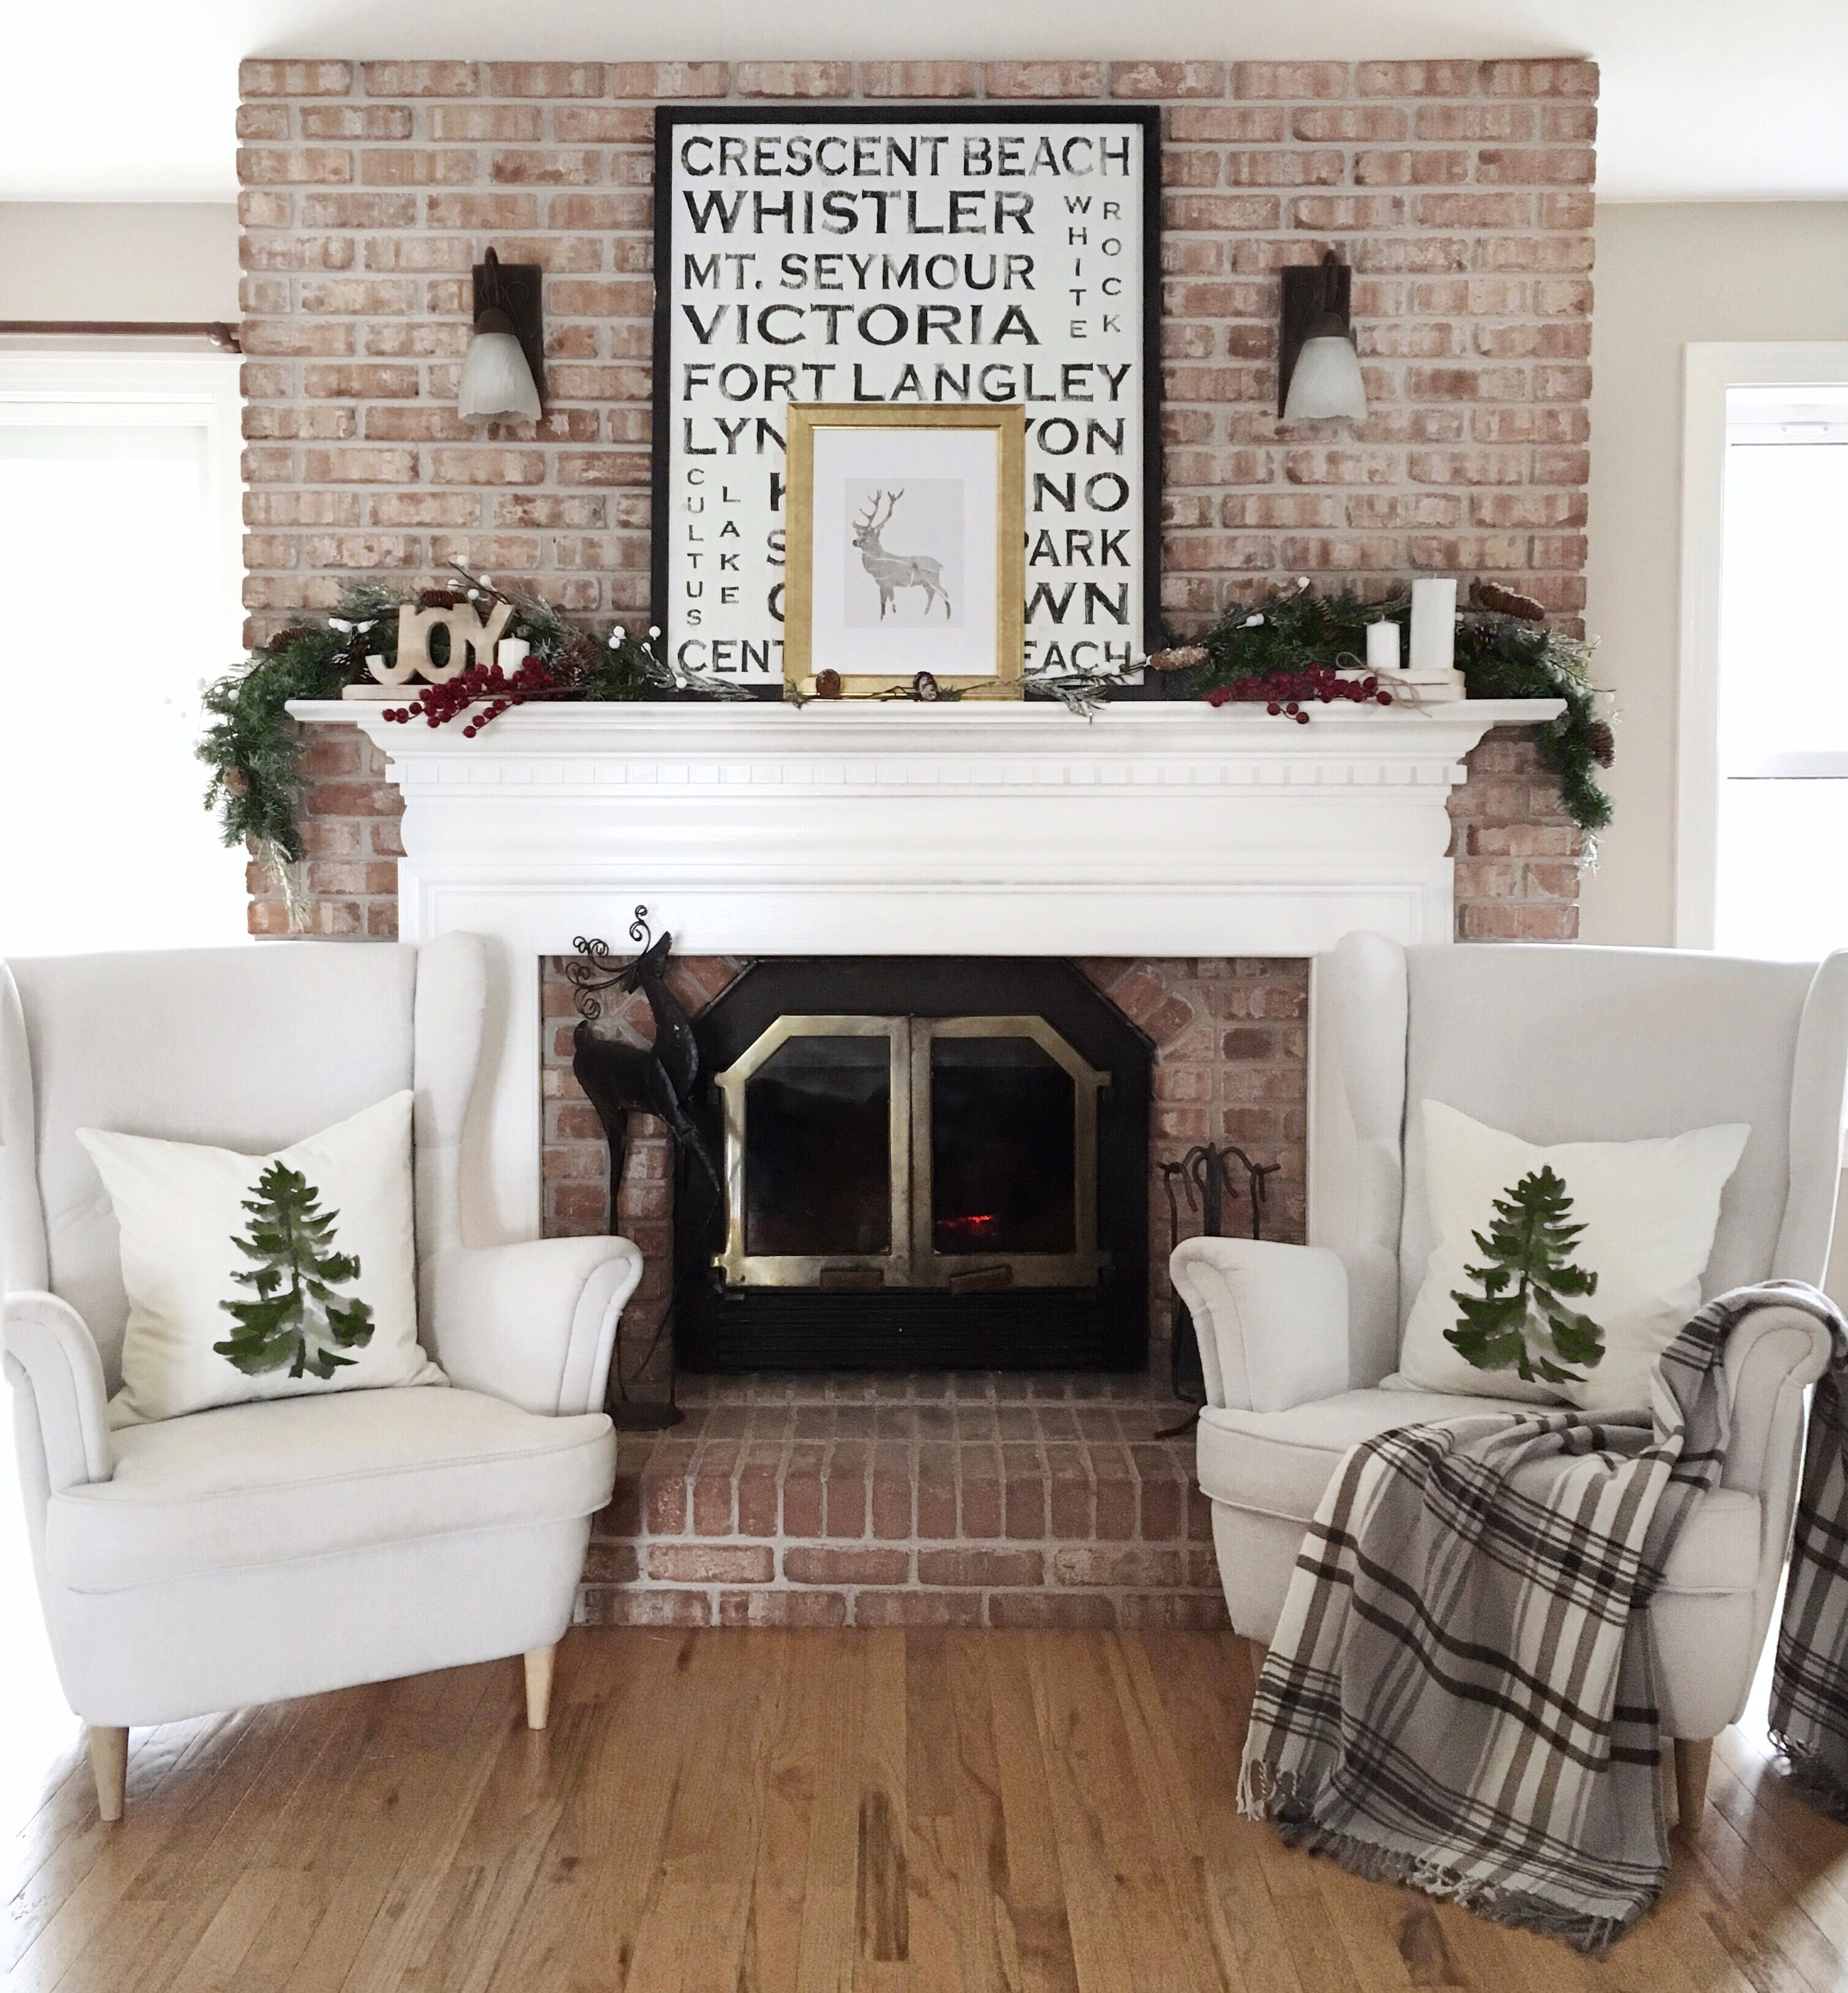 Classic Christmas By The Fireplace Living Room Diy Diy Home Decor On A Budget Home Decor